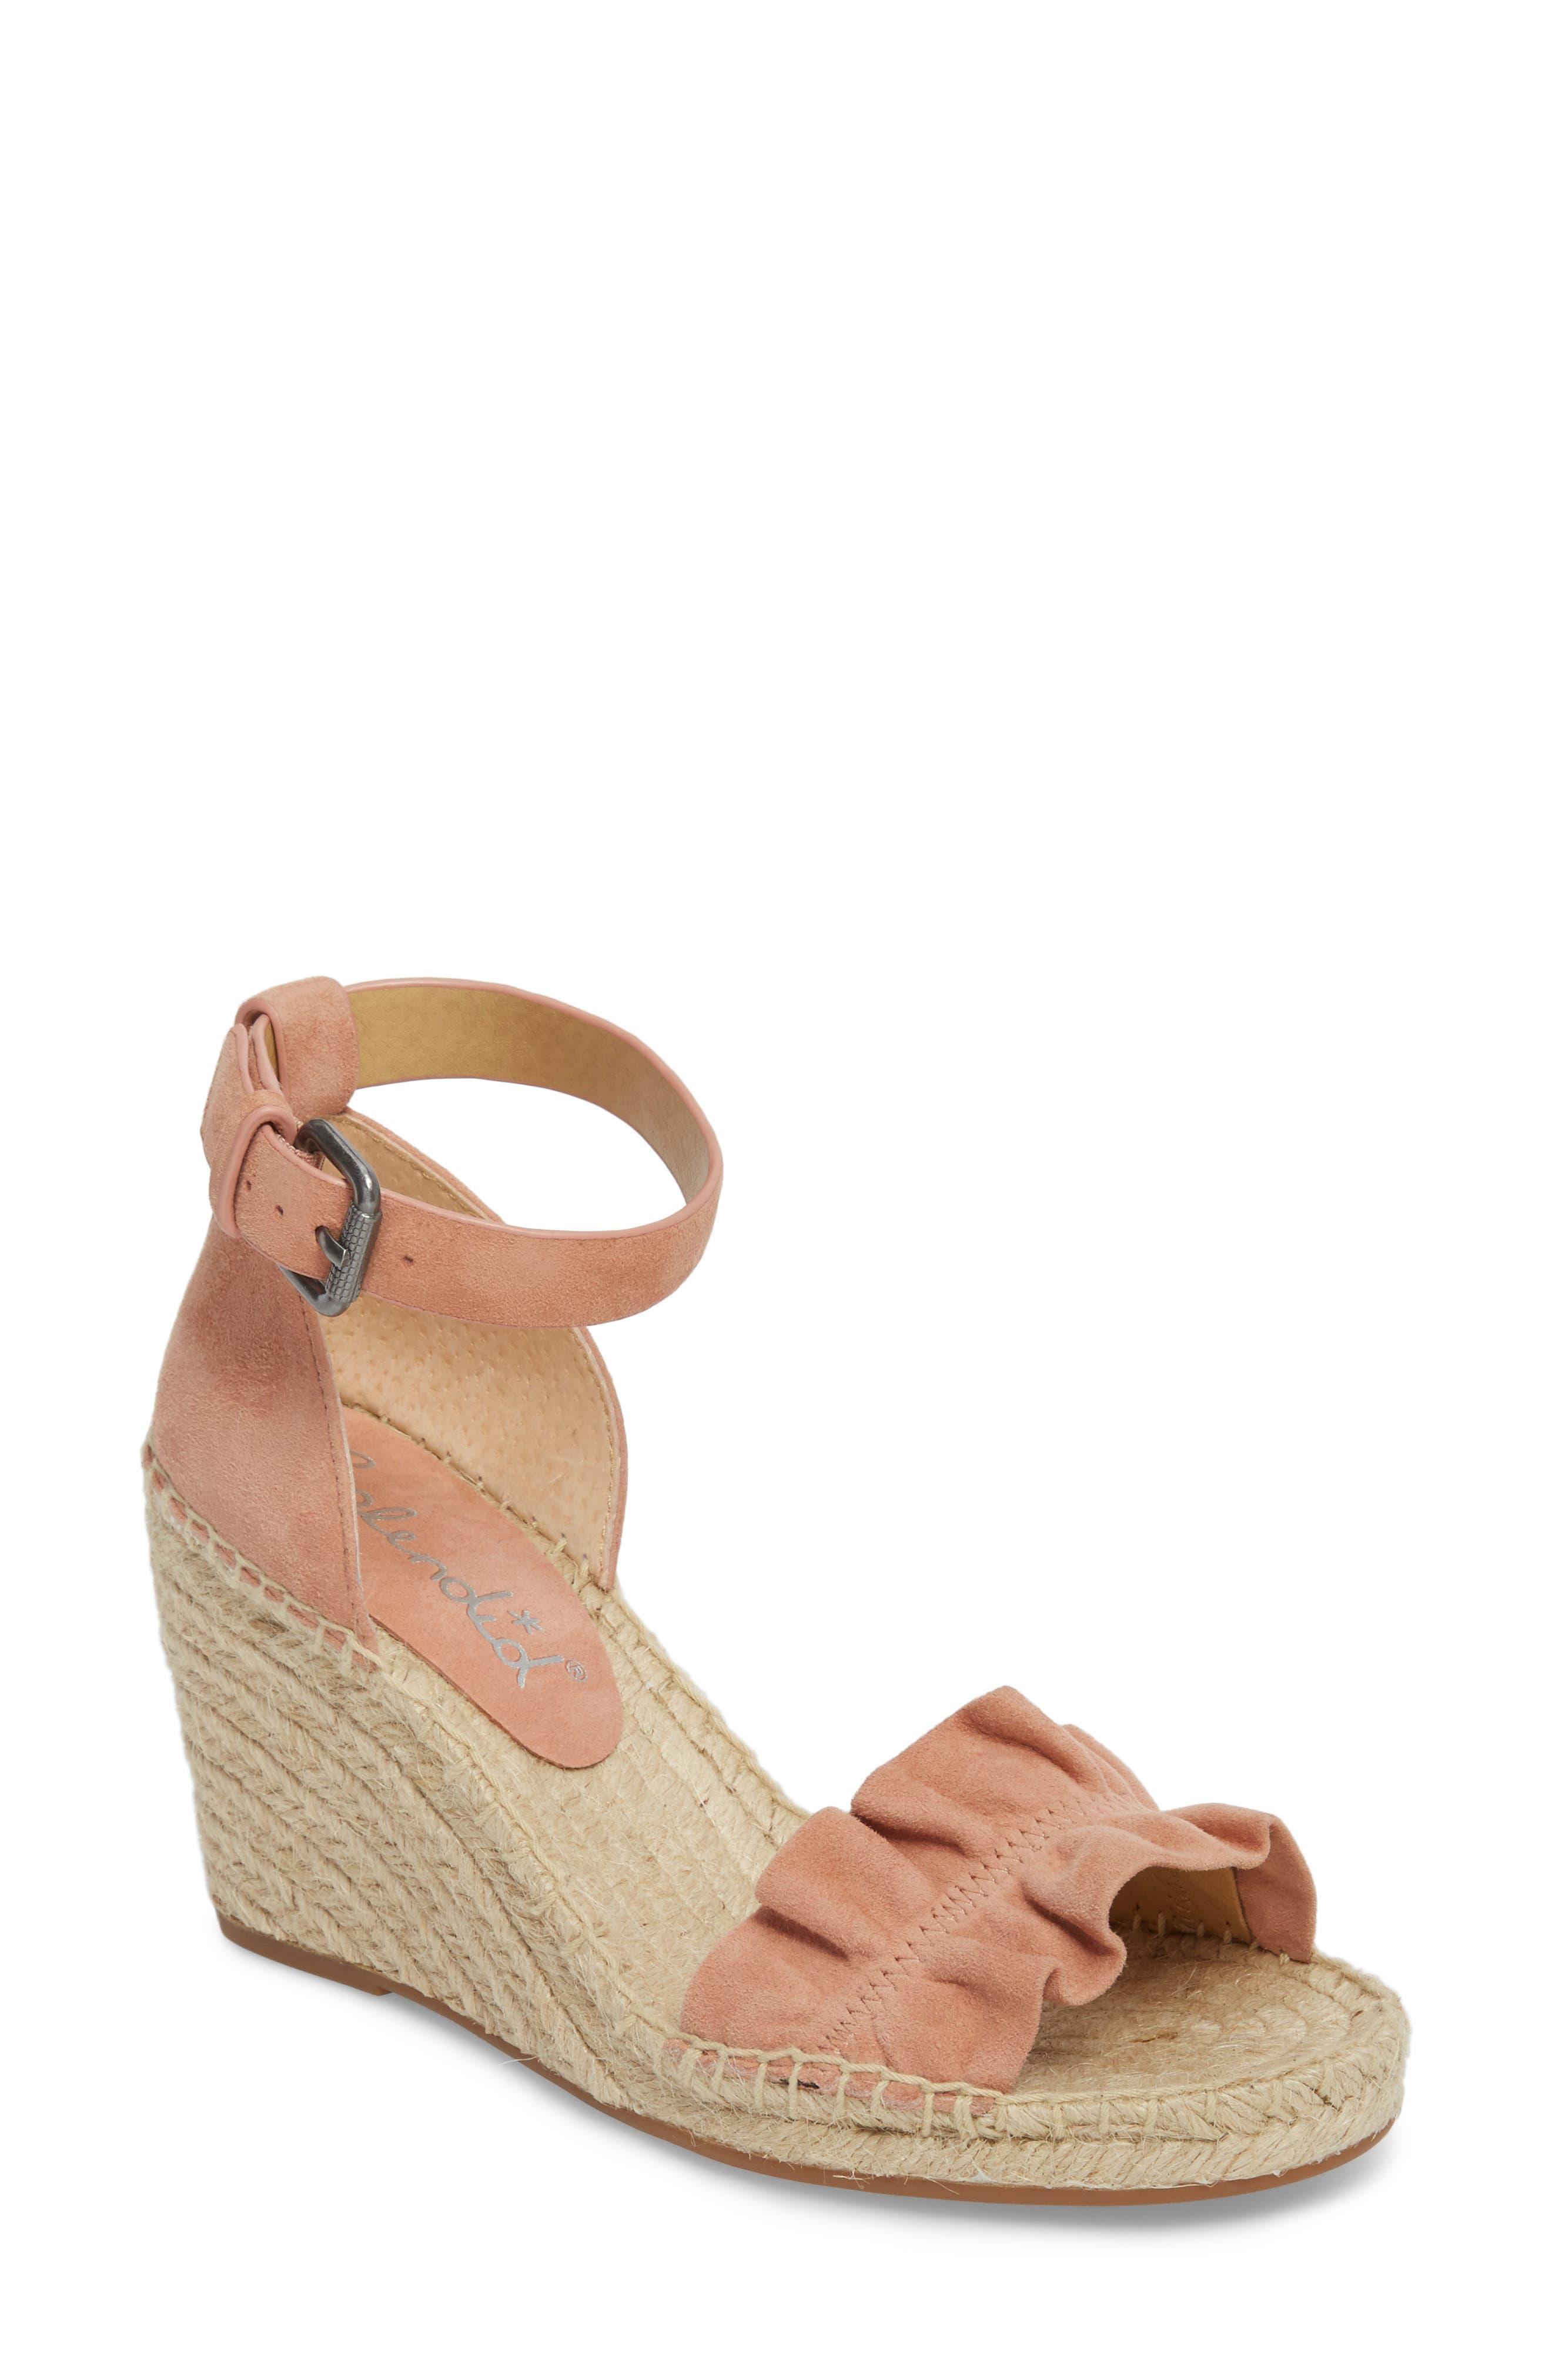 Bedford Espadrille Wedge Sandal,                             Main thumbnail 1, color,                             Dark Blush Suede